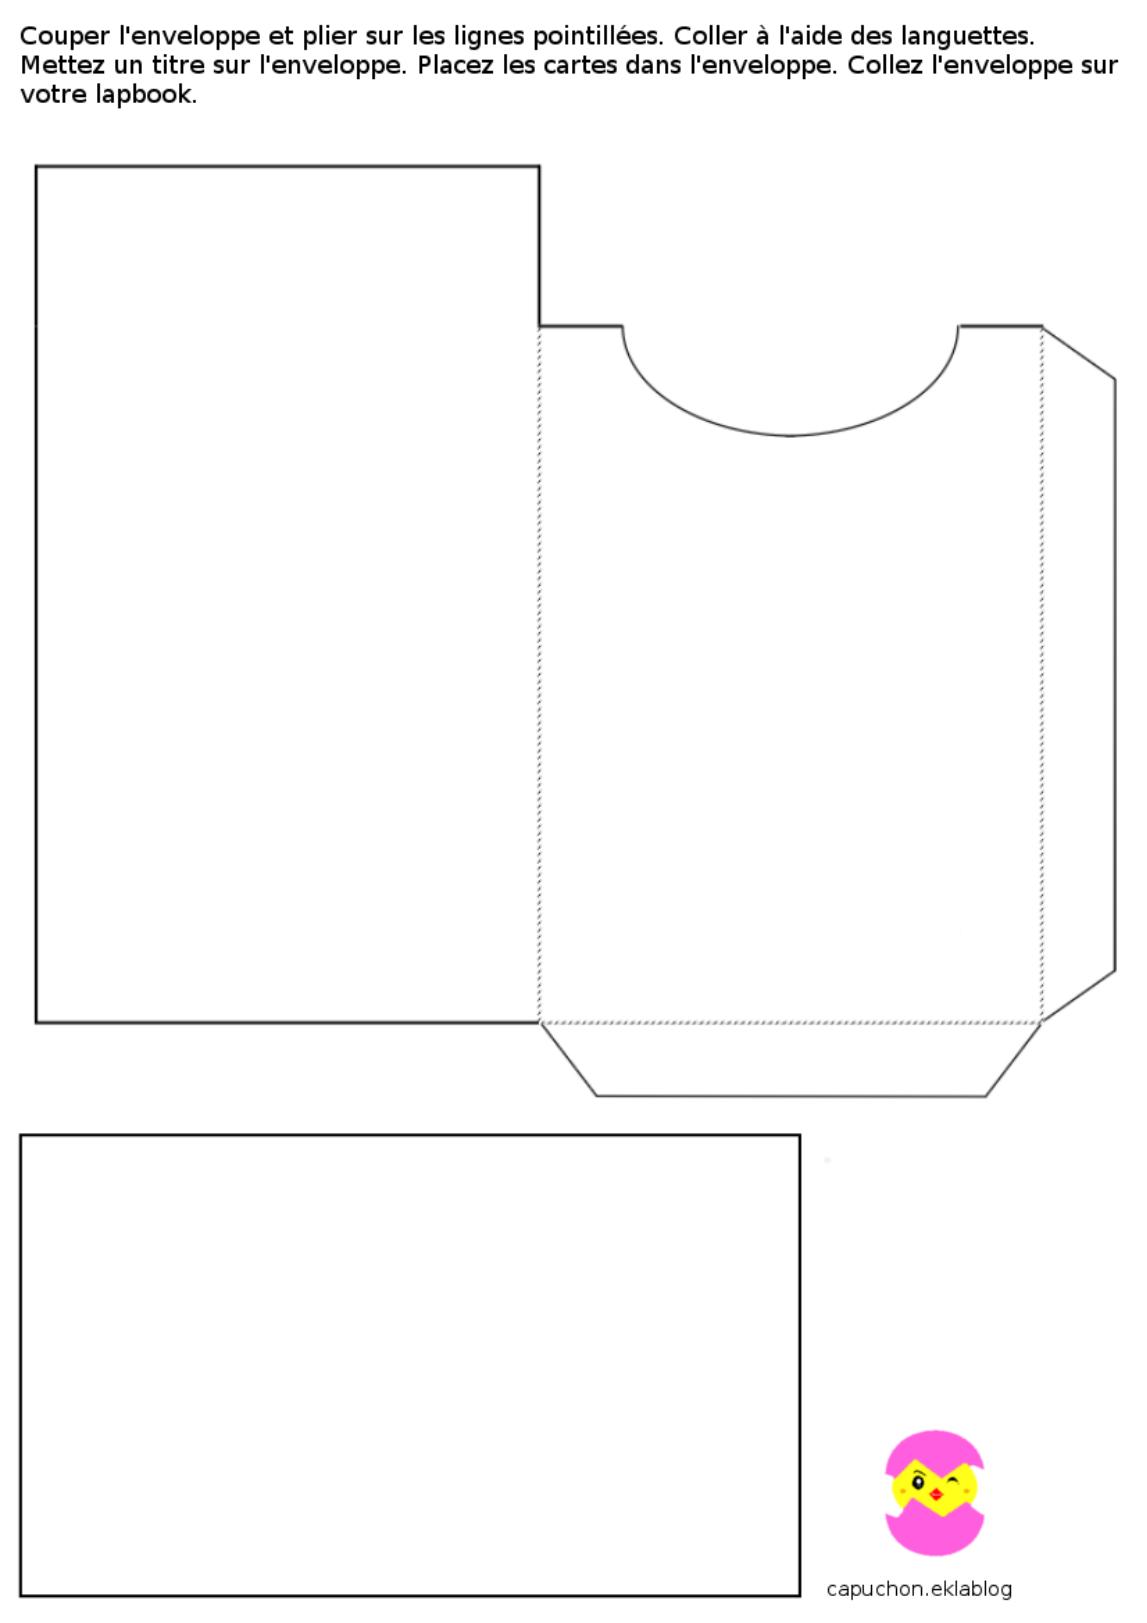 Lapbook Capuchon A L Ecole Printable Collage Sheet Print Planner Homemade Envelopes